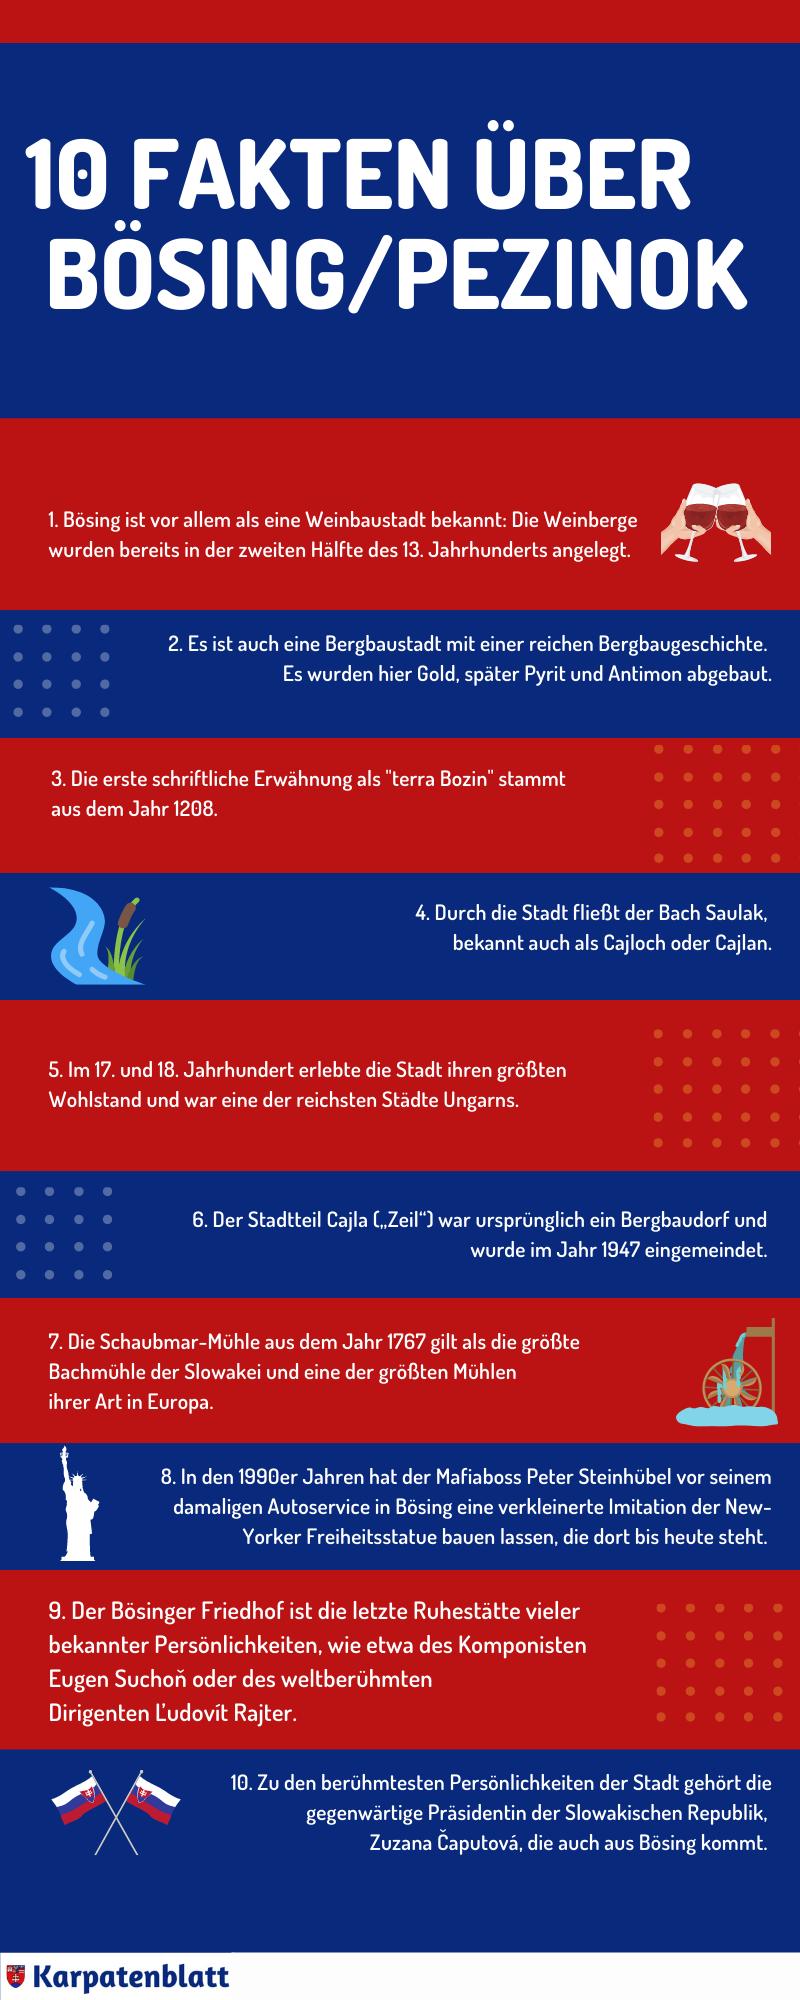 10 Fakten über Pezinok